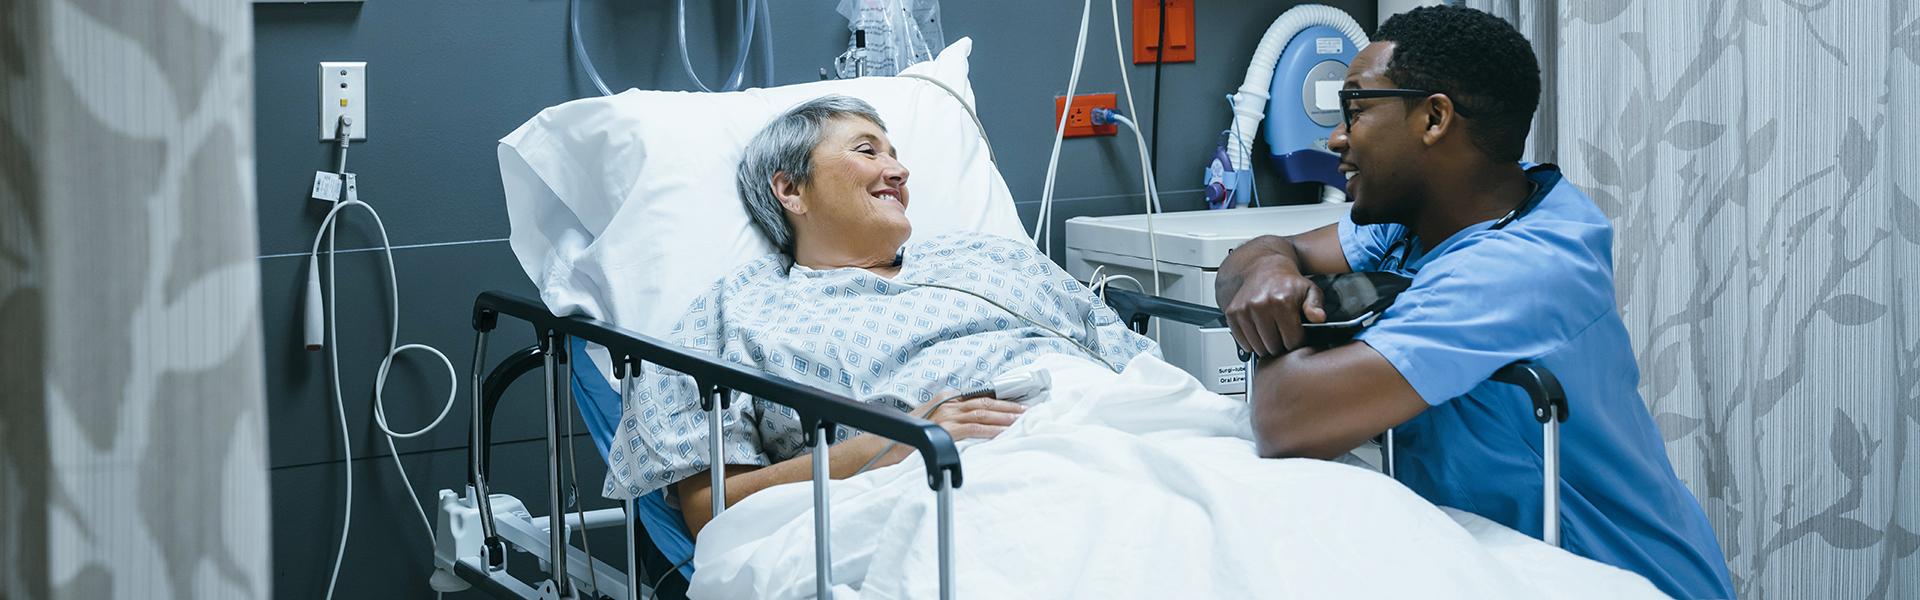 Improving the Patient Experience: Meet Abel Kissaru